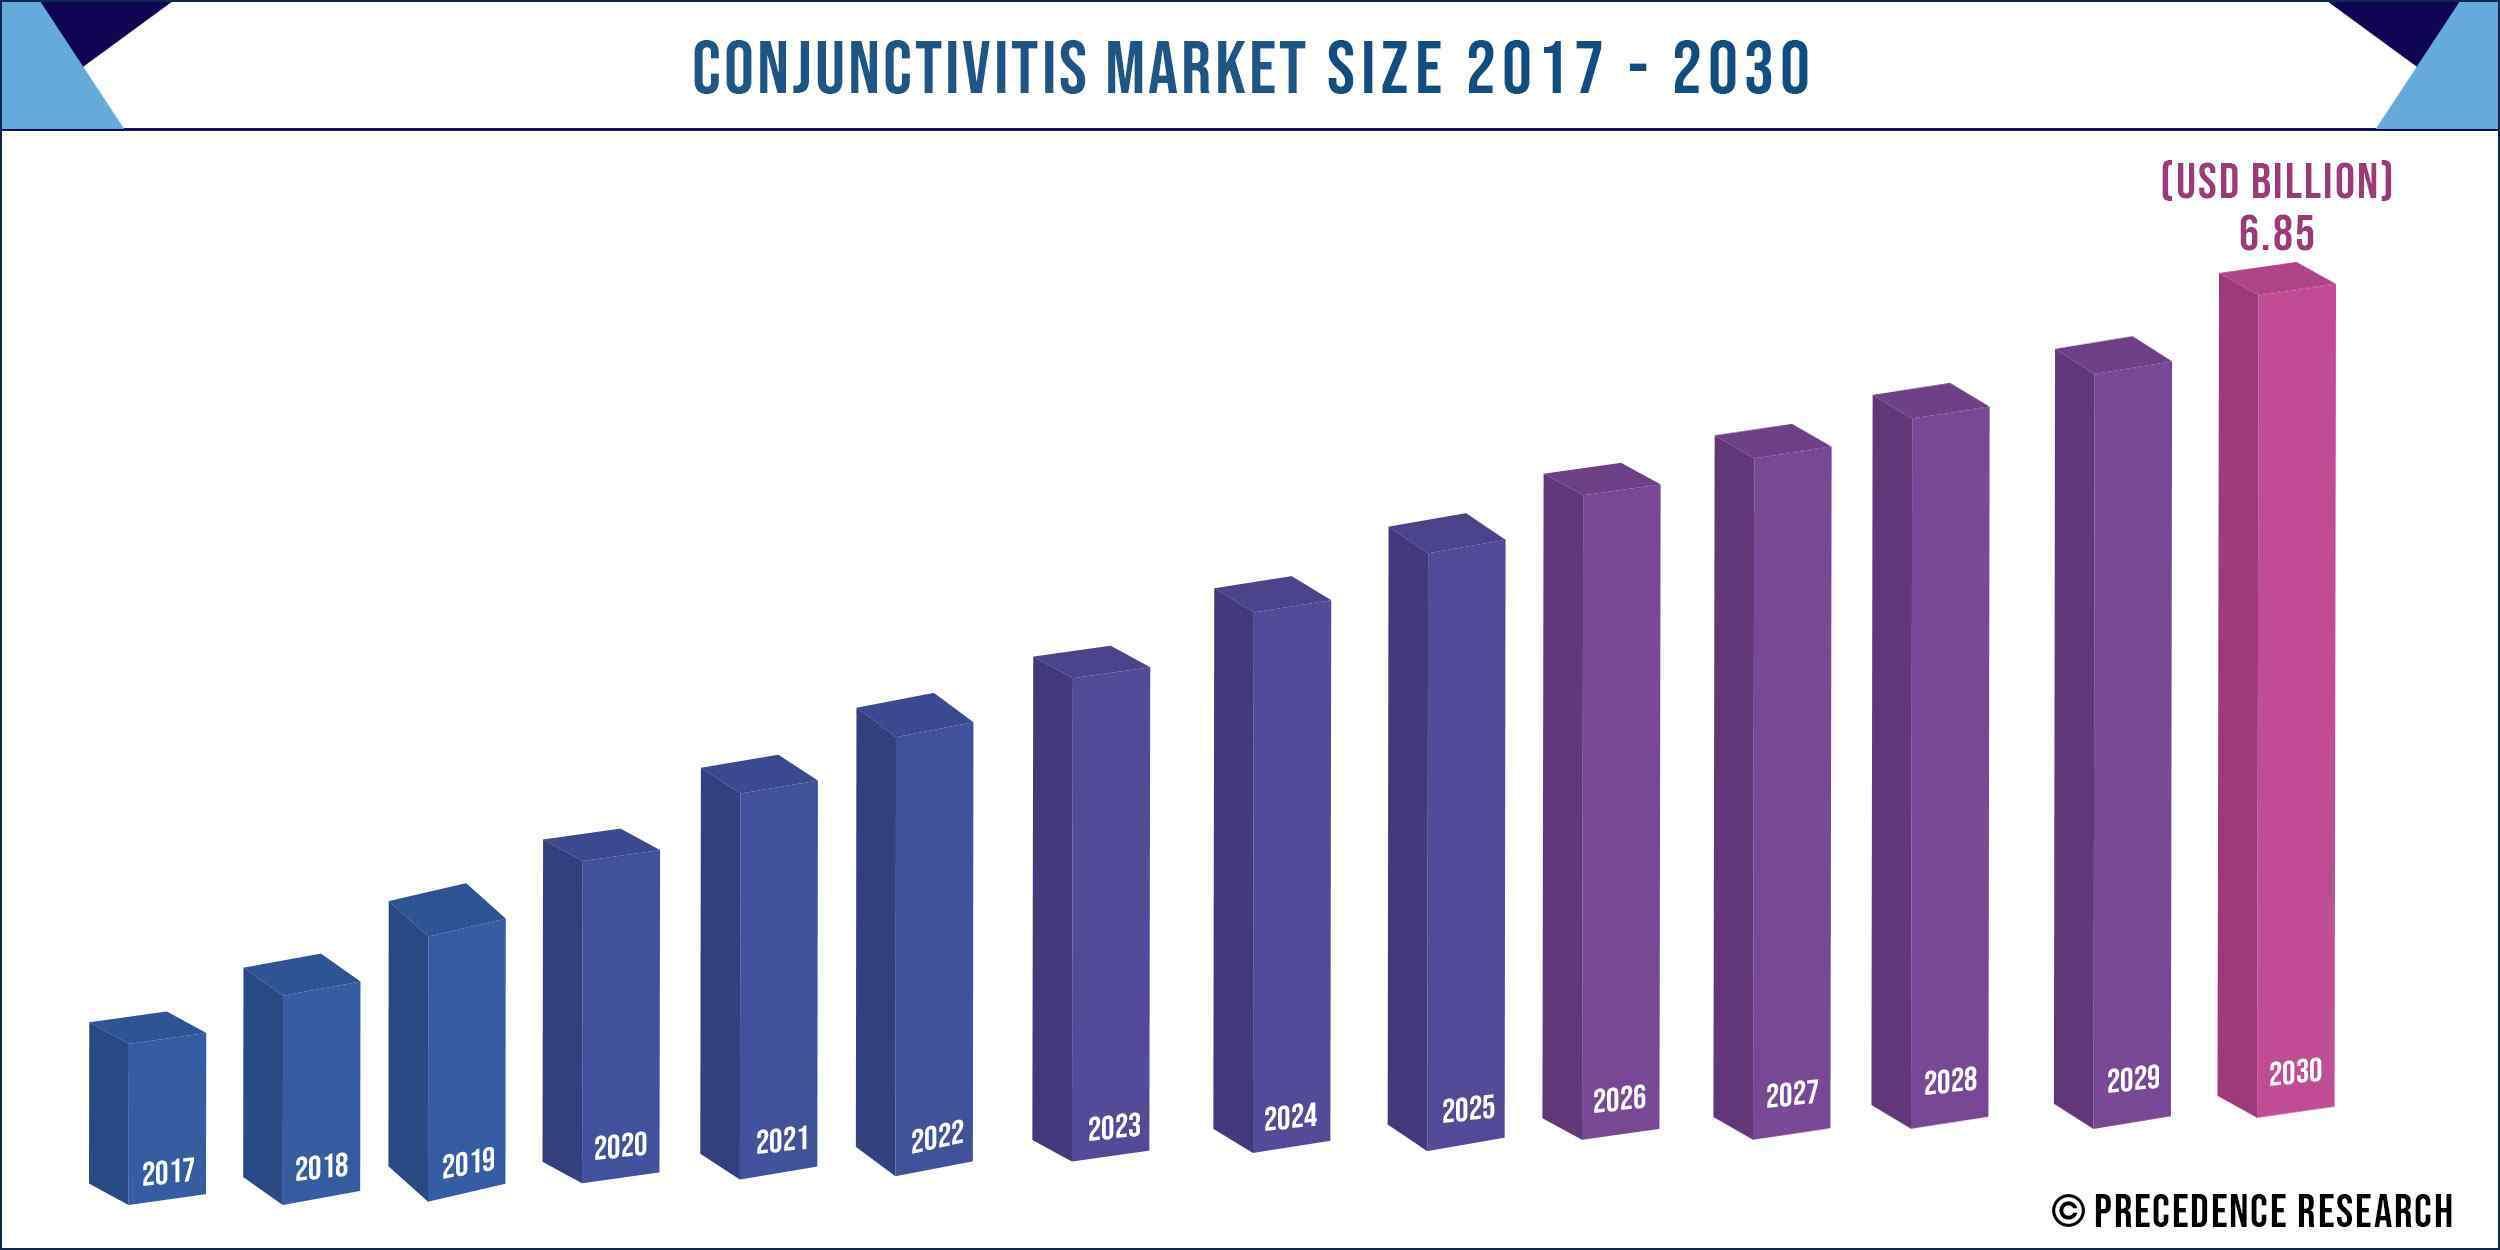 Conjunctivitis Market Size 2017-2030